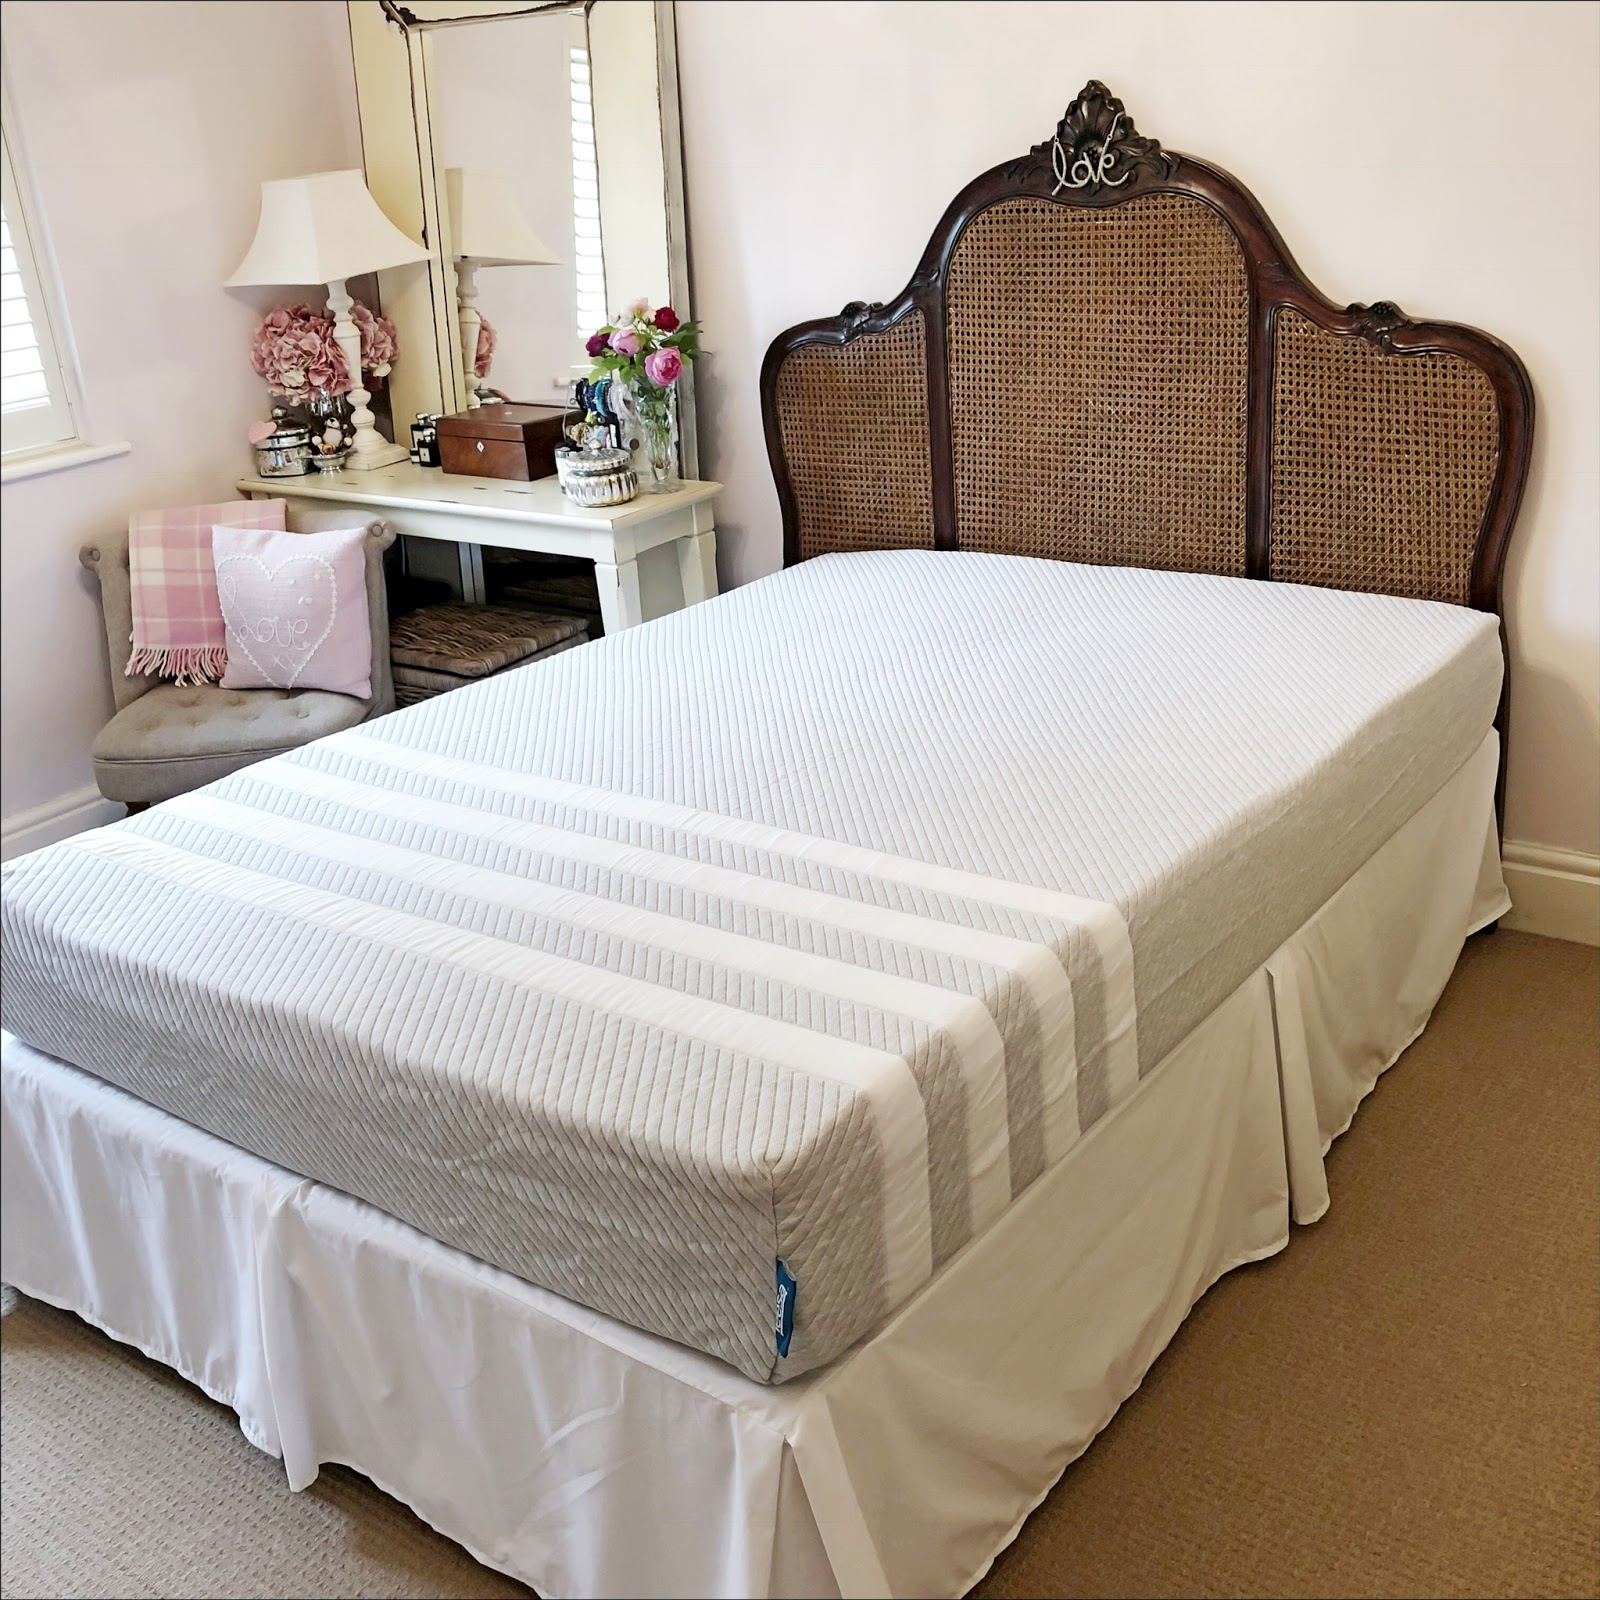 my midlife fashion, leesa mattress